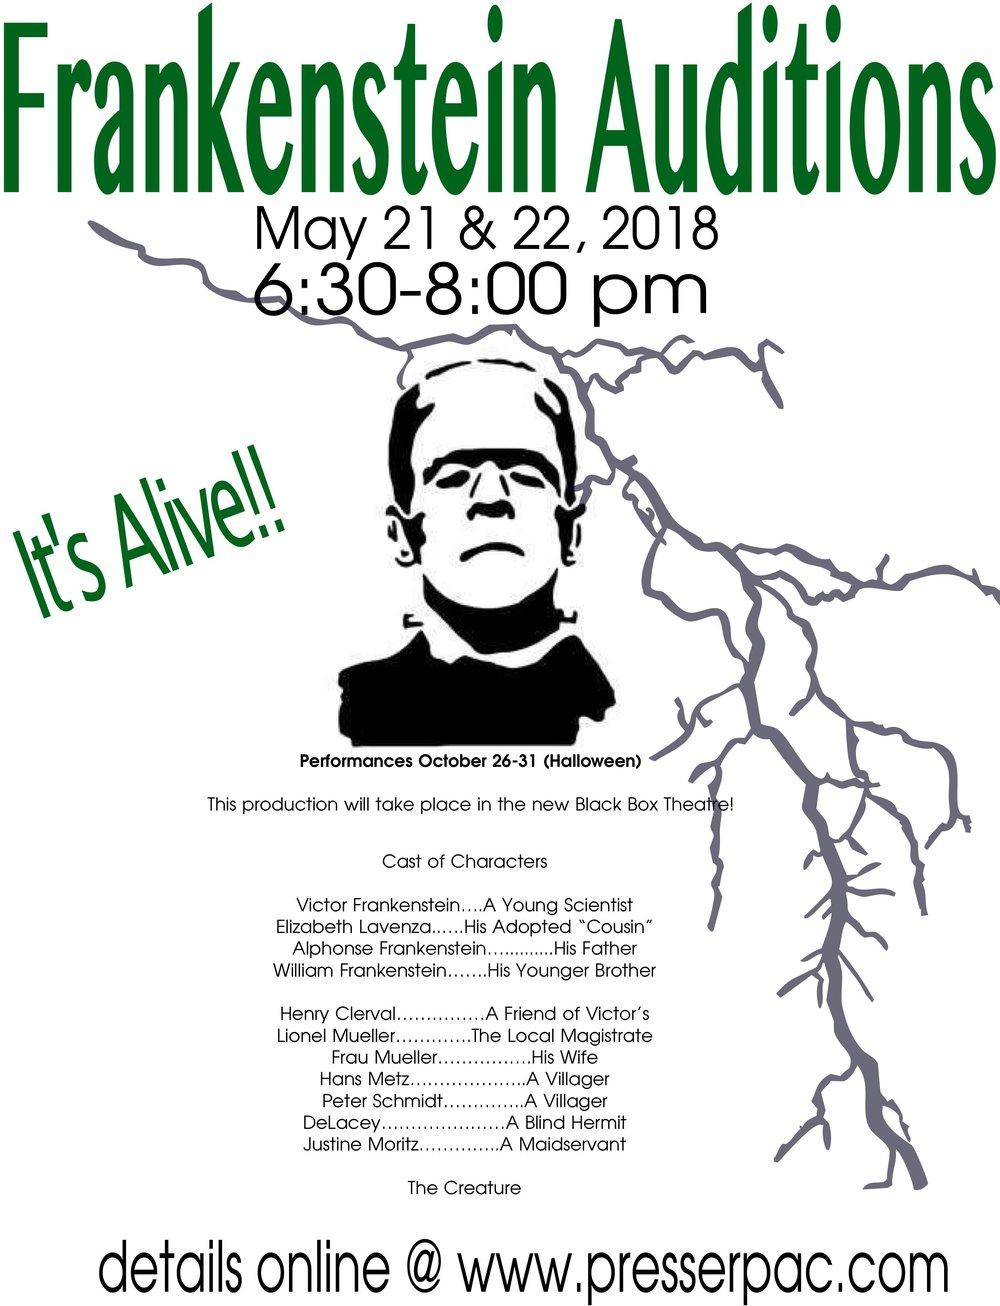 Frankenstein Auditions Poster.jpeg